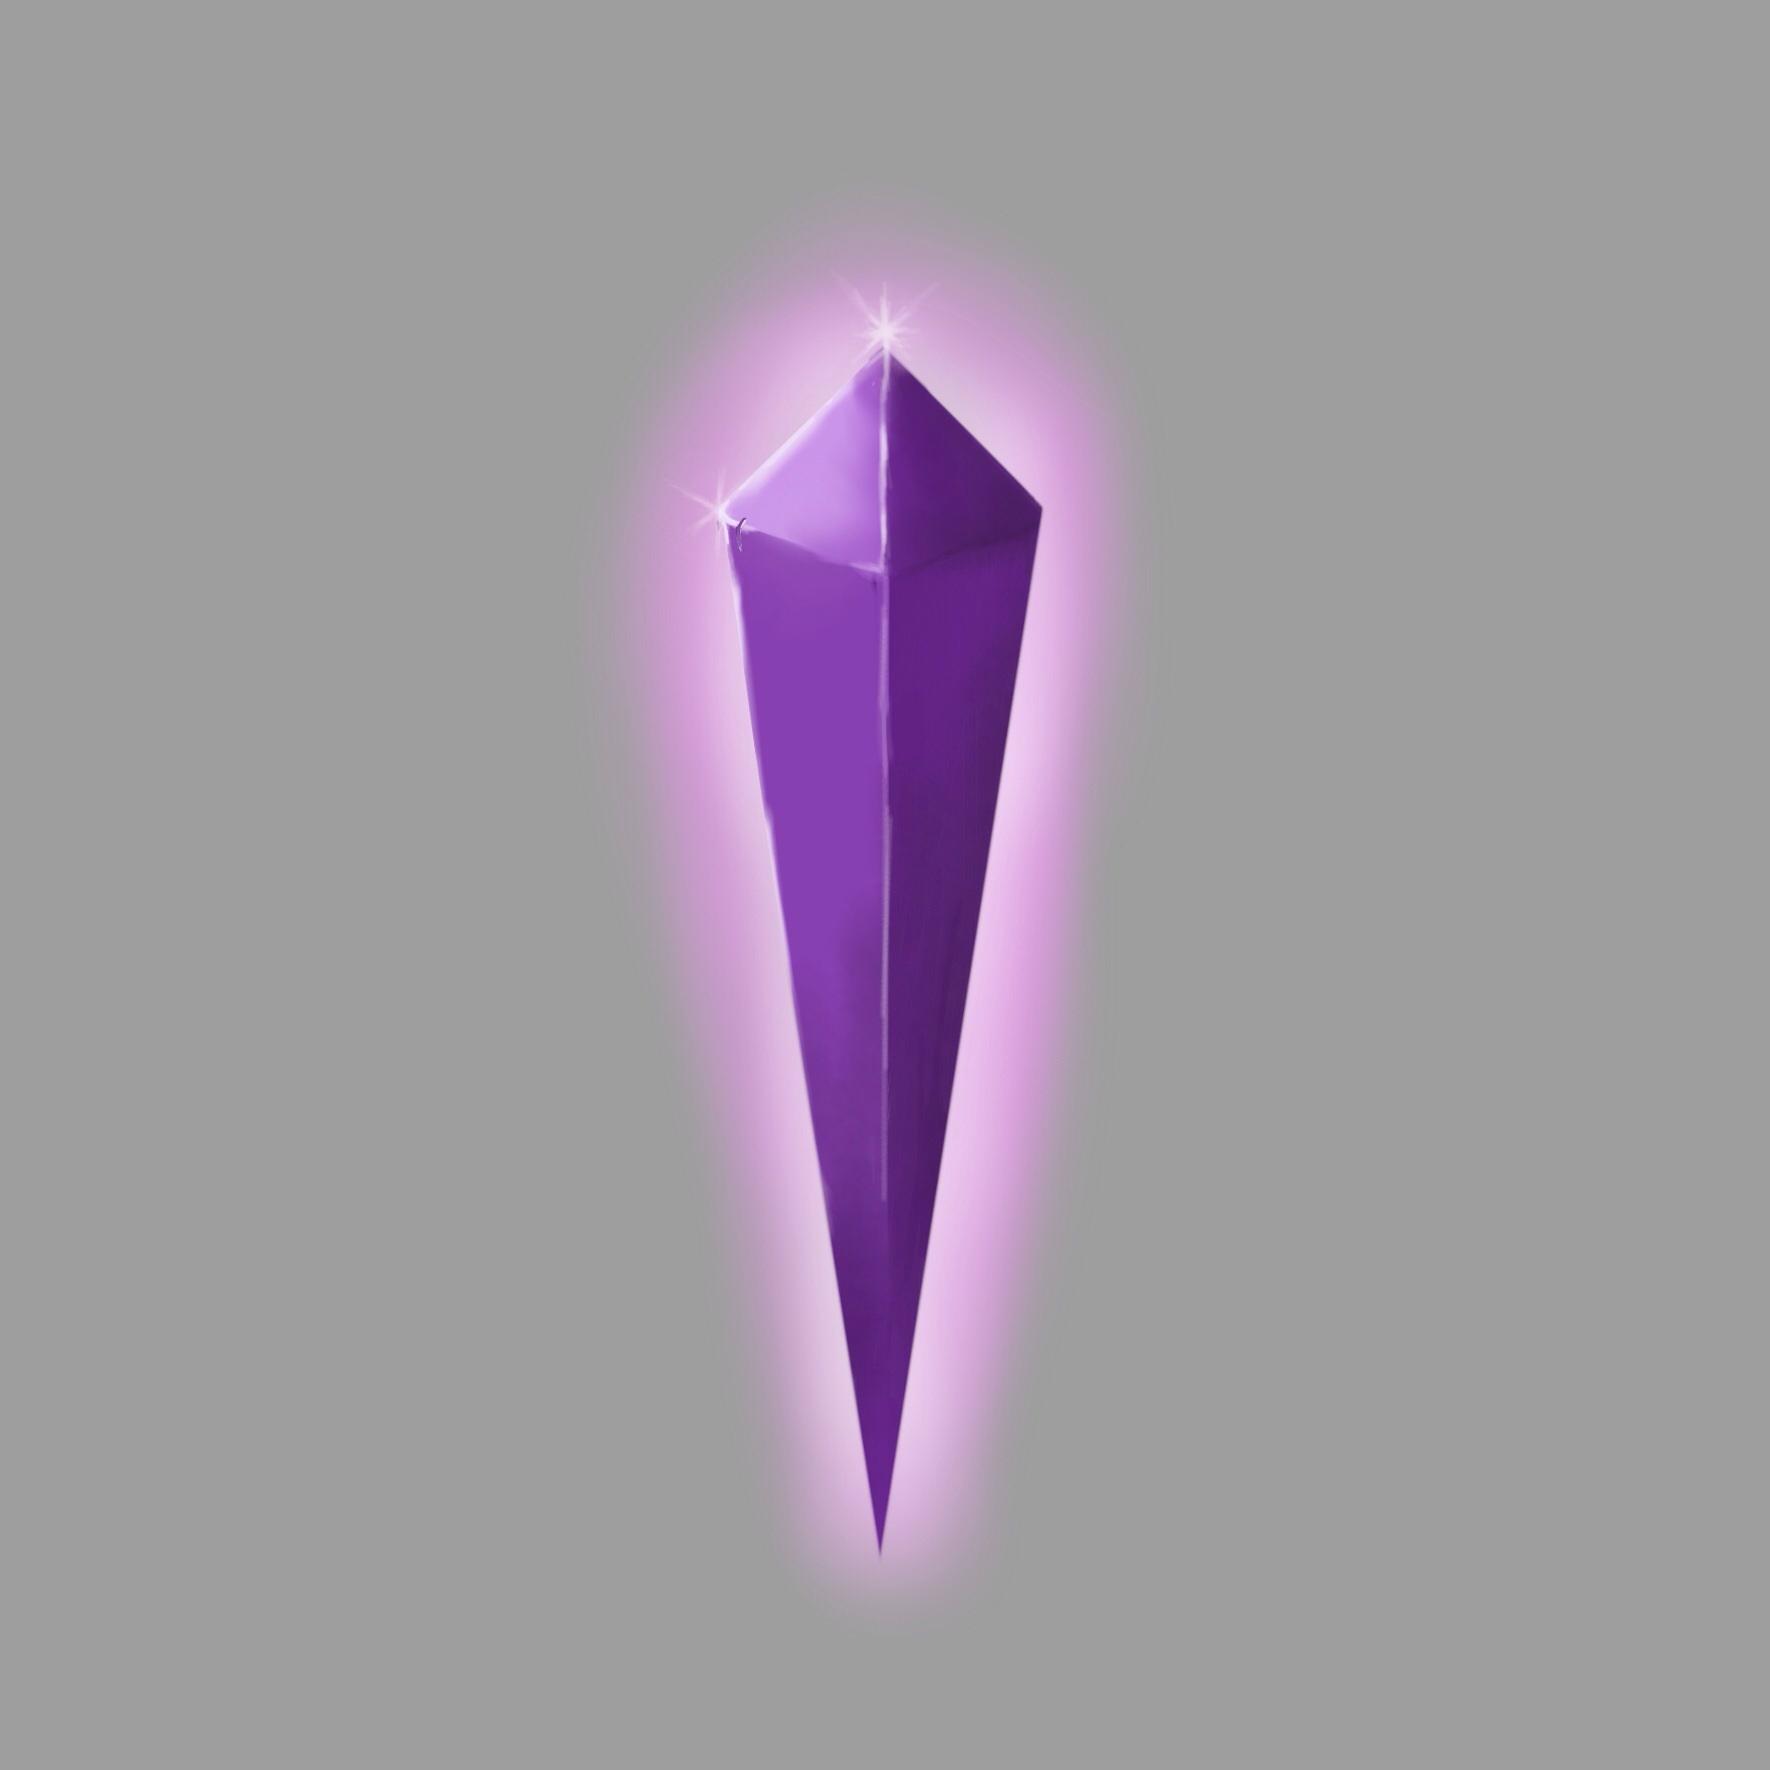 Crash bandicoot crystal